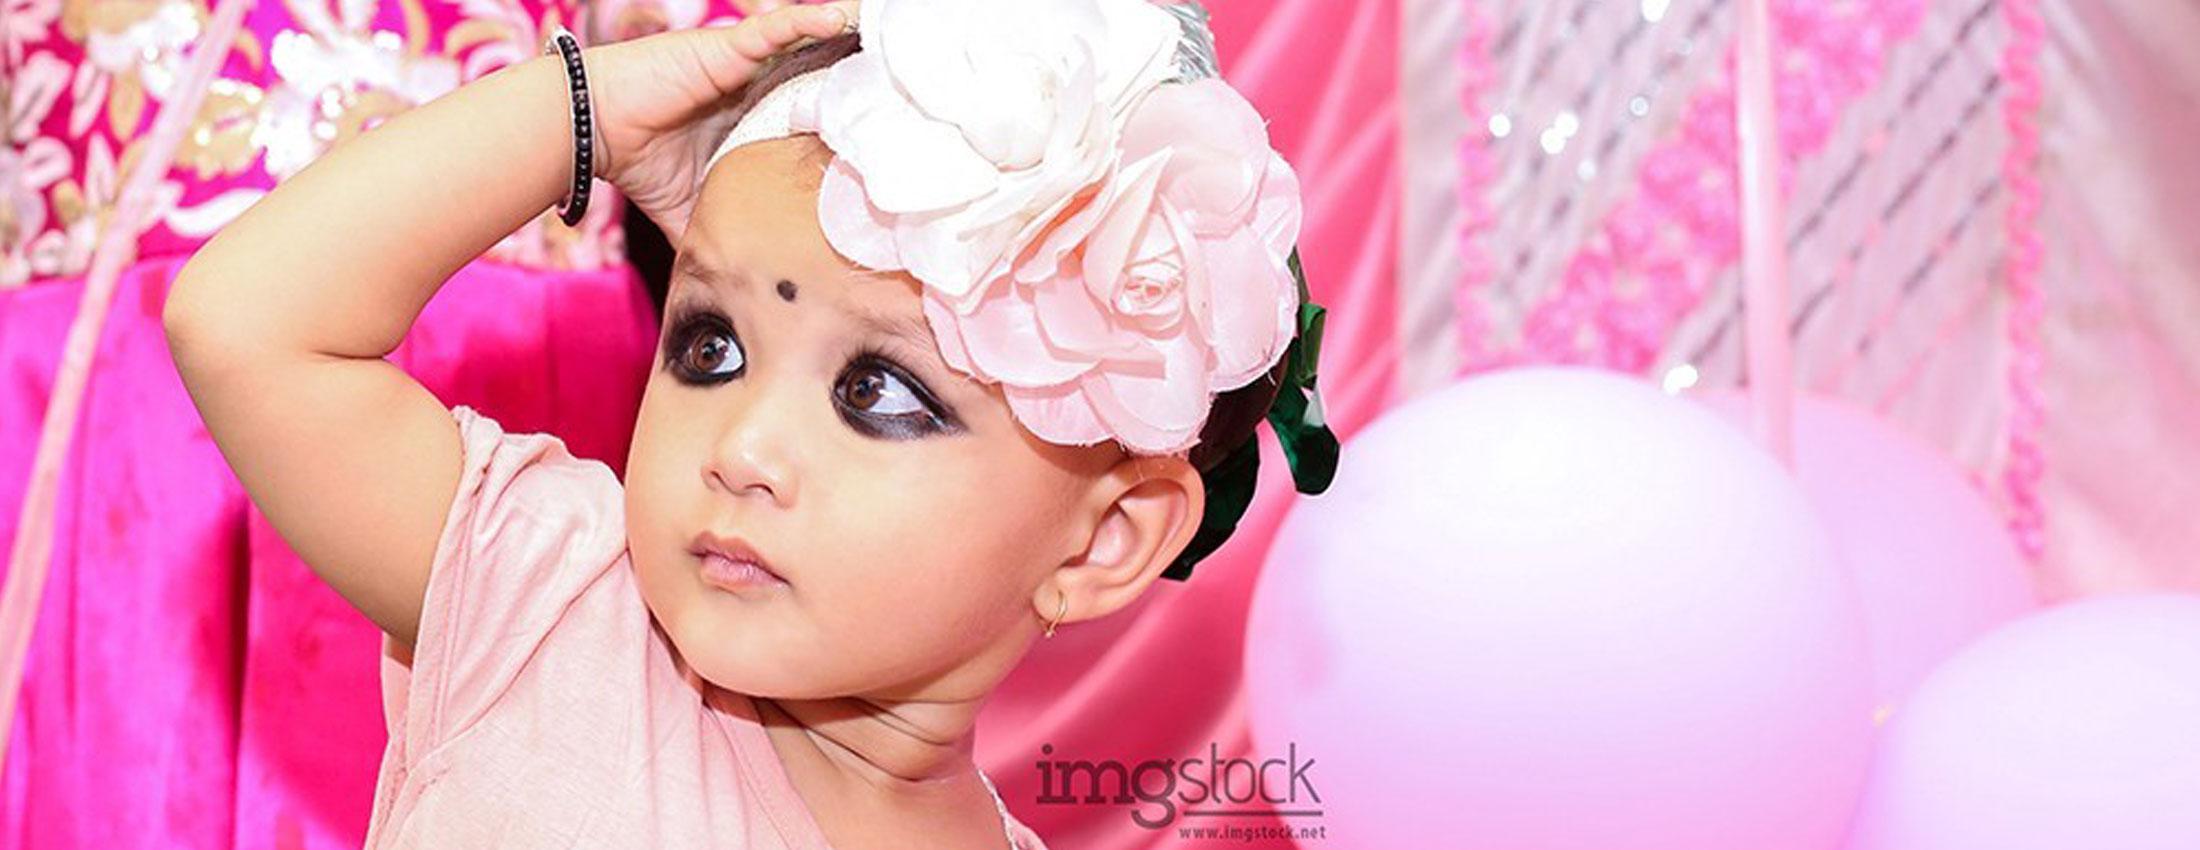 Kids Photoshoot - Imgstock, Biratnagar